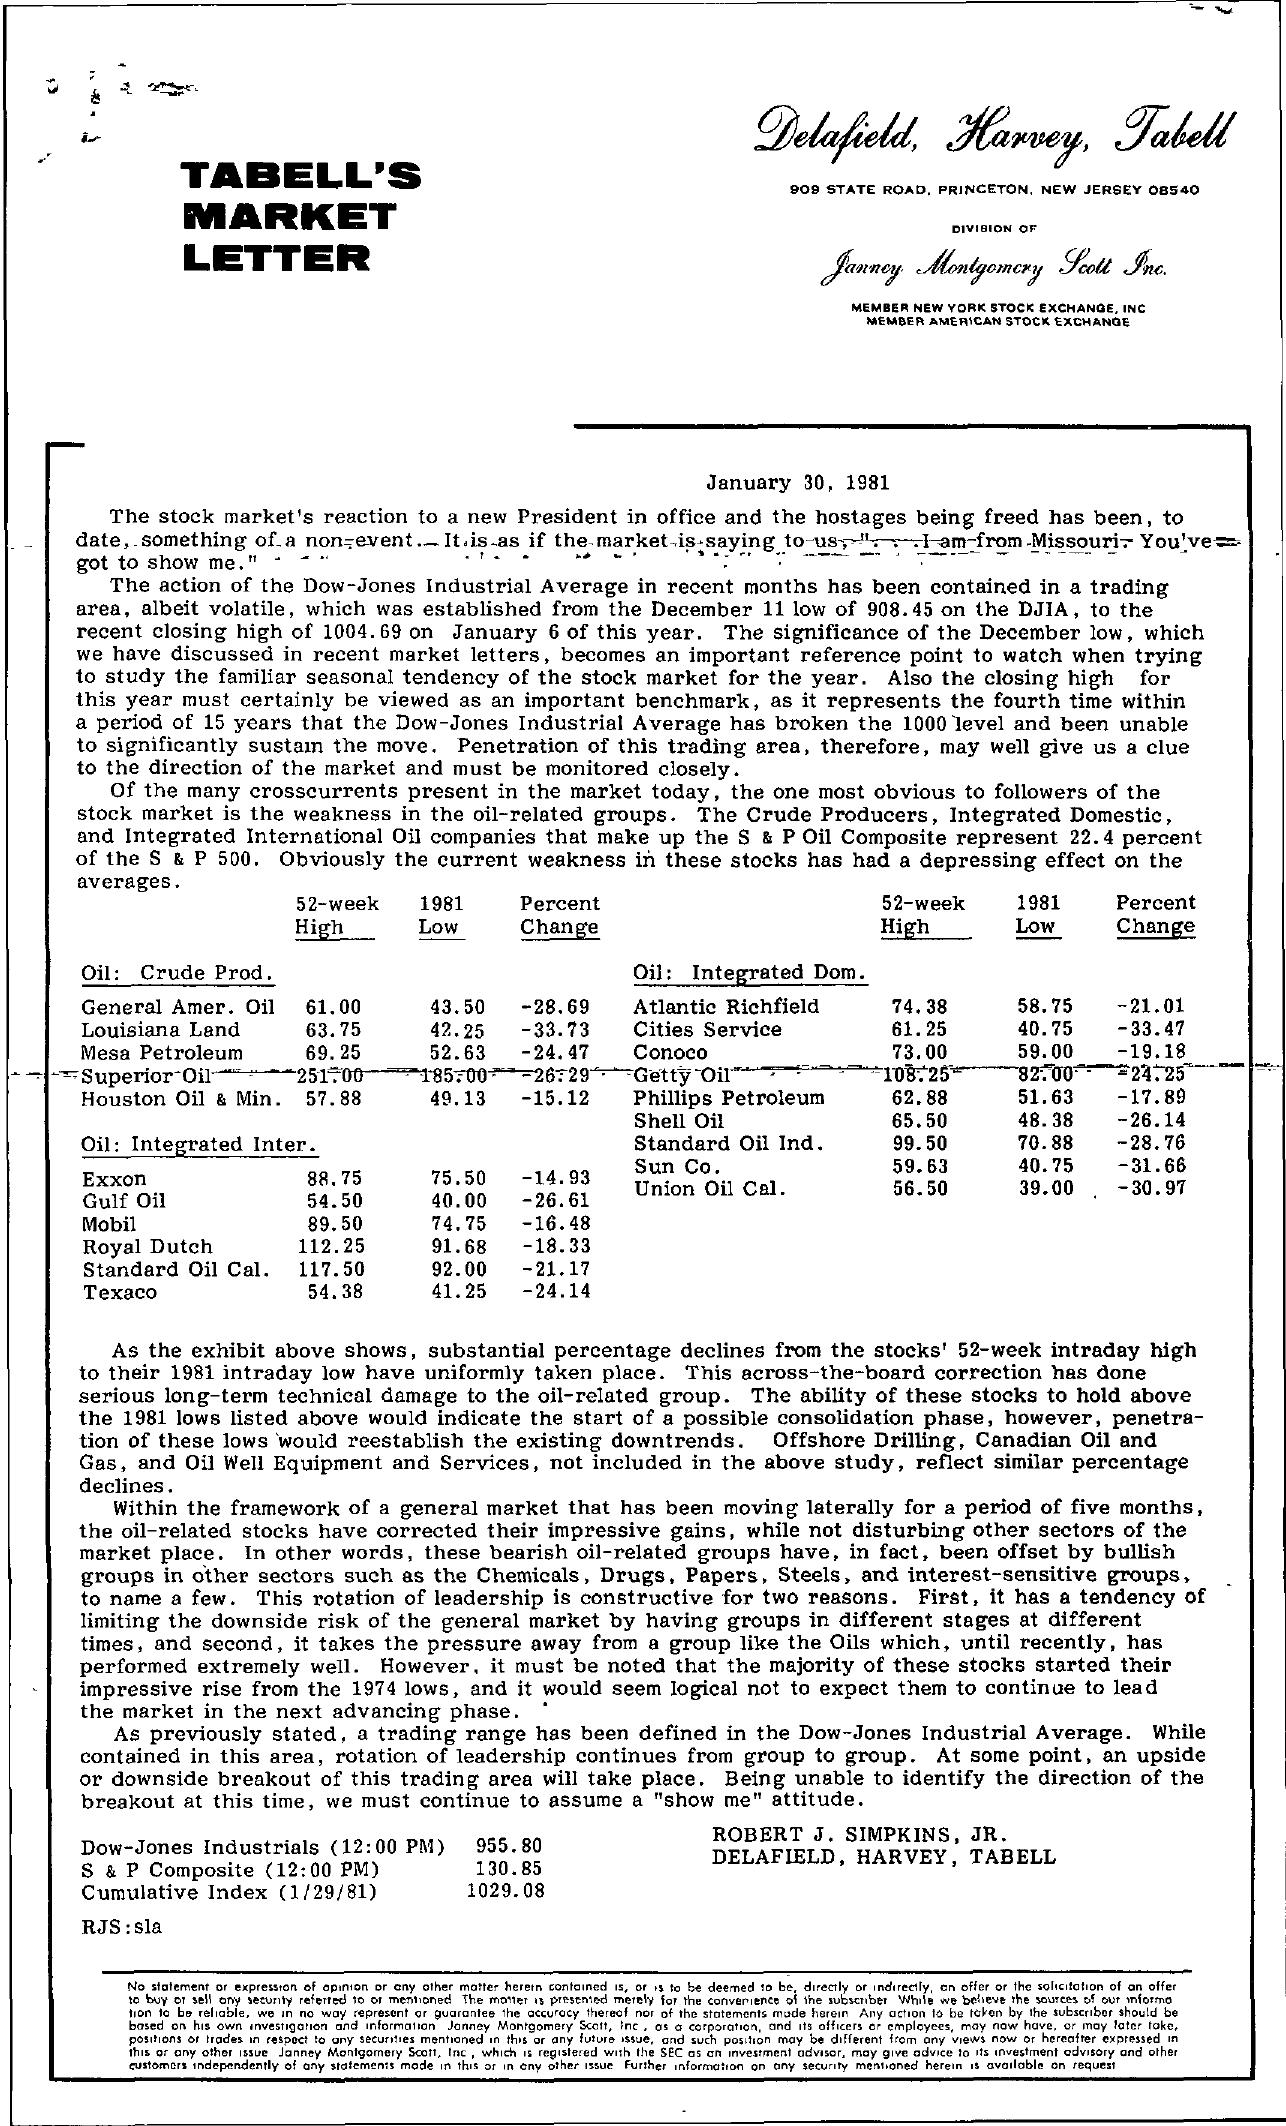 Tabell's Market Letter - January 30, 1981